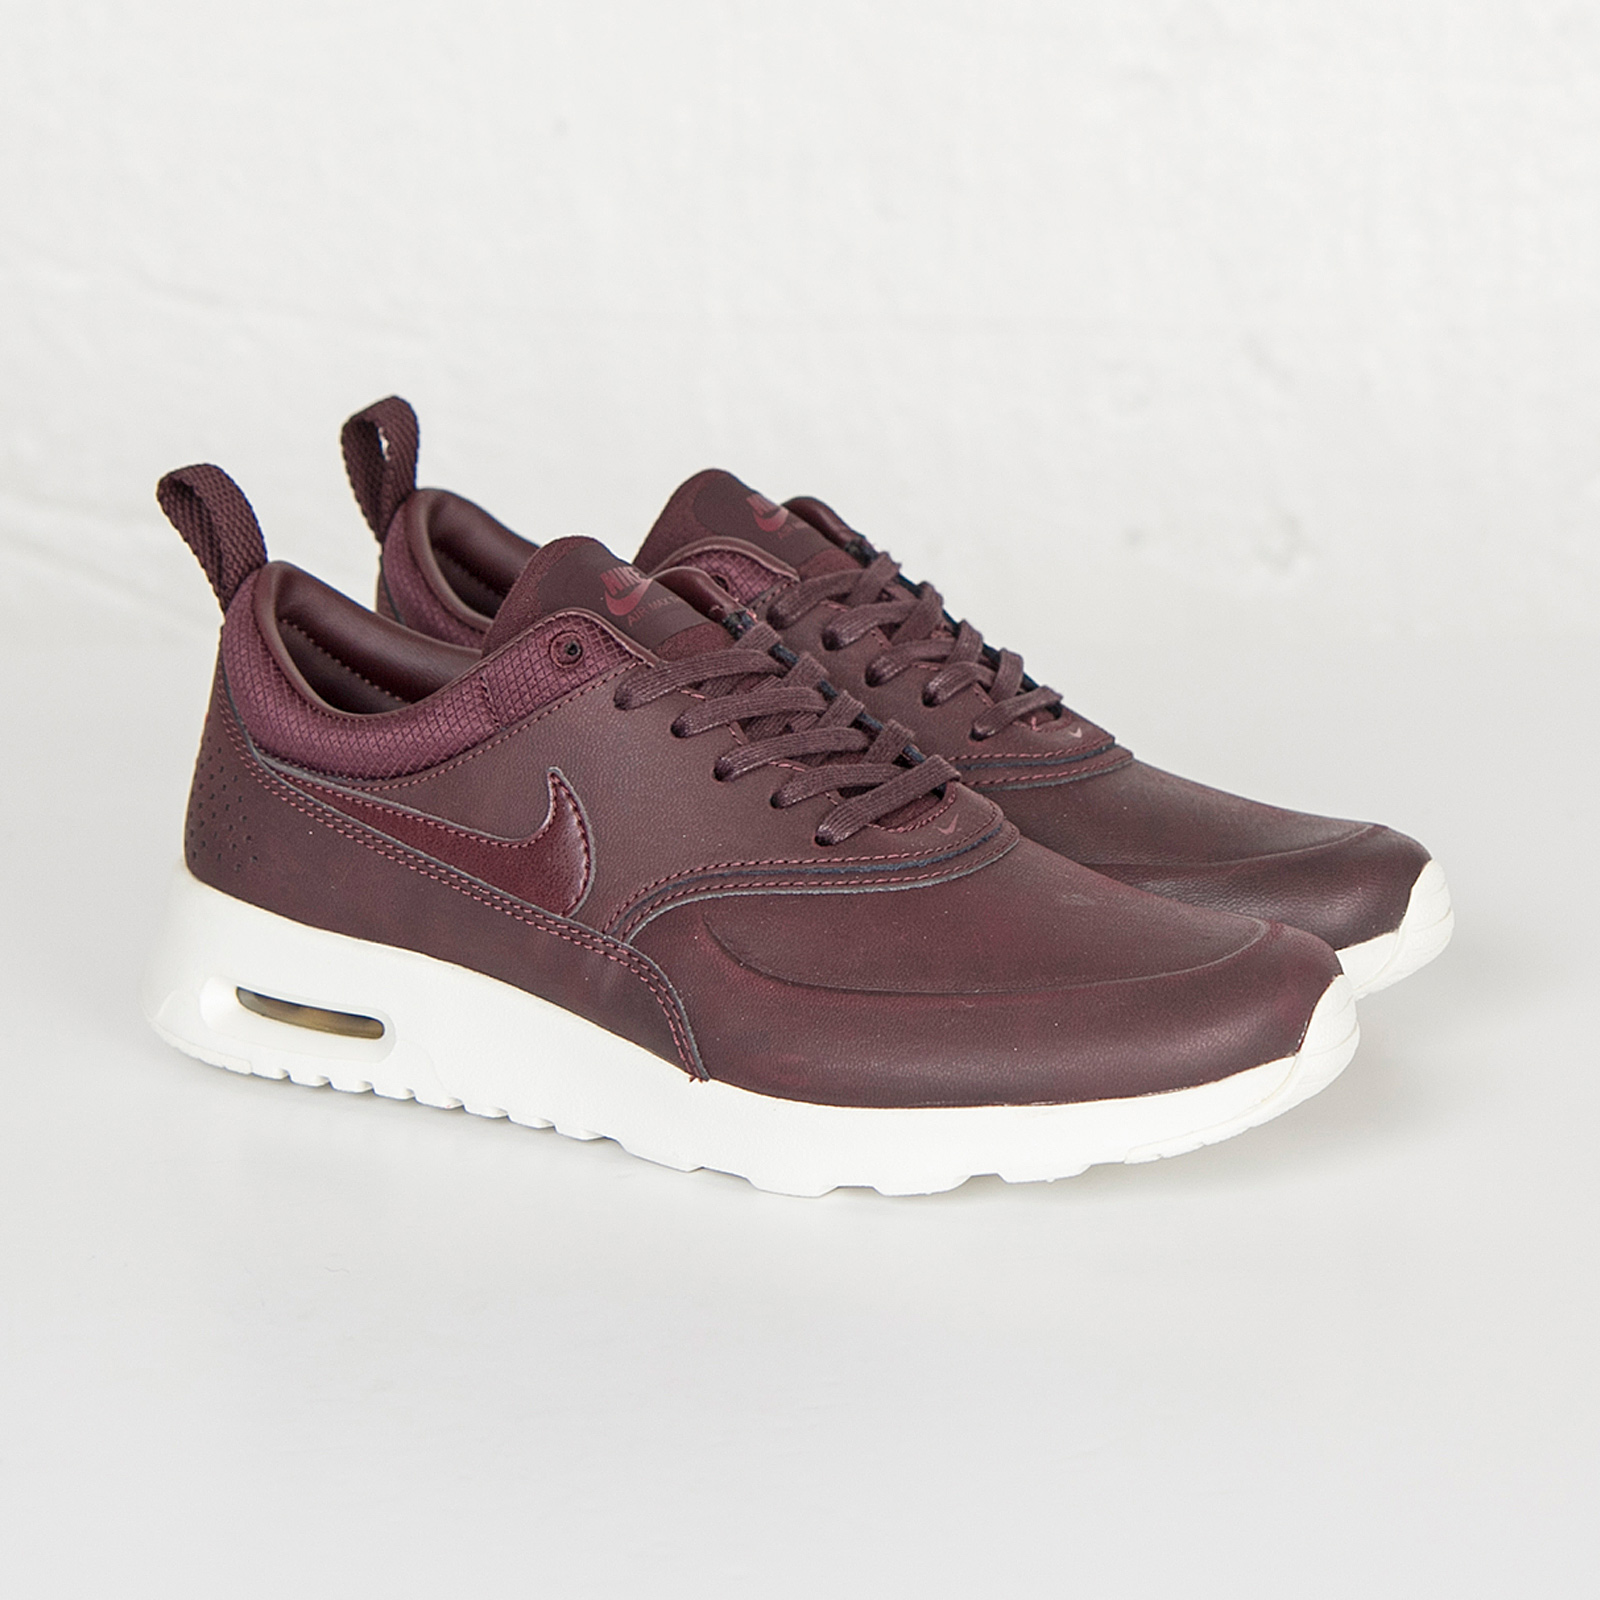 info for 2947b 0386e Nike Wmns Air Max Thea Premium - 616723-200 - Sneakersnstuff ...